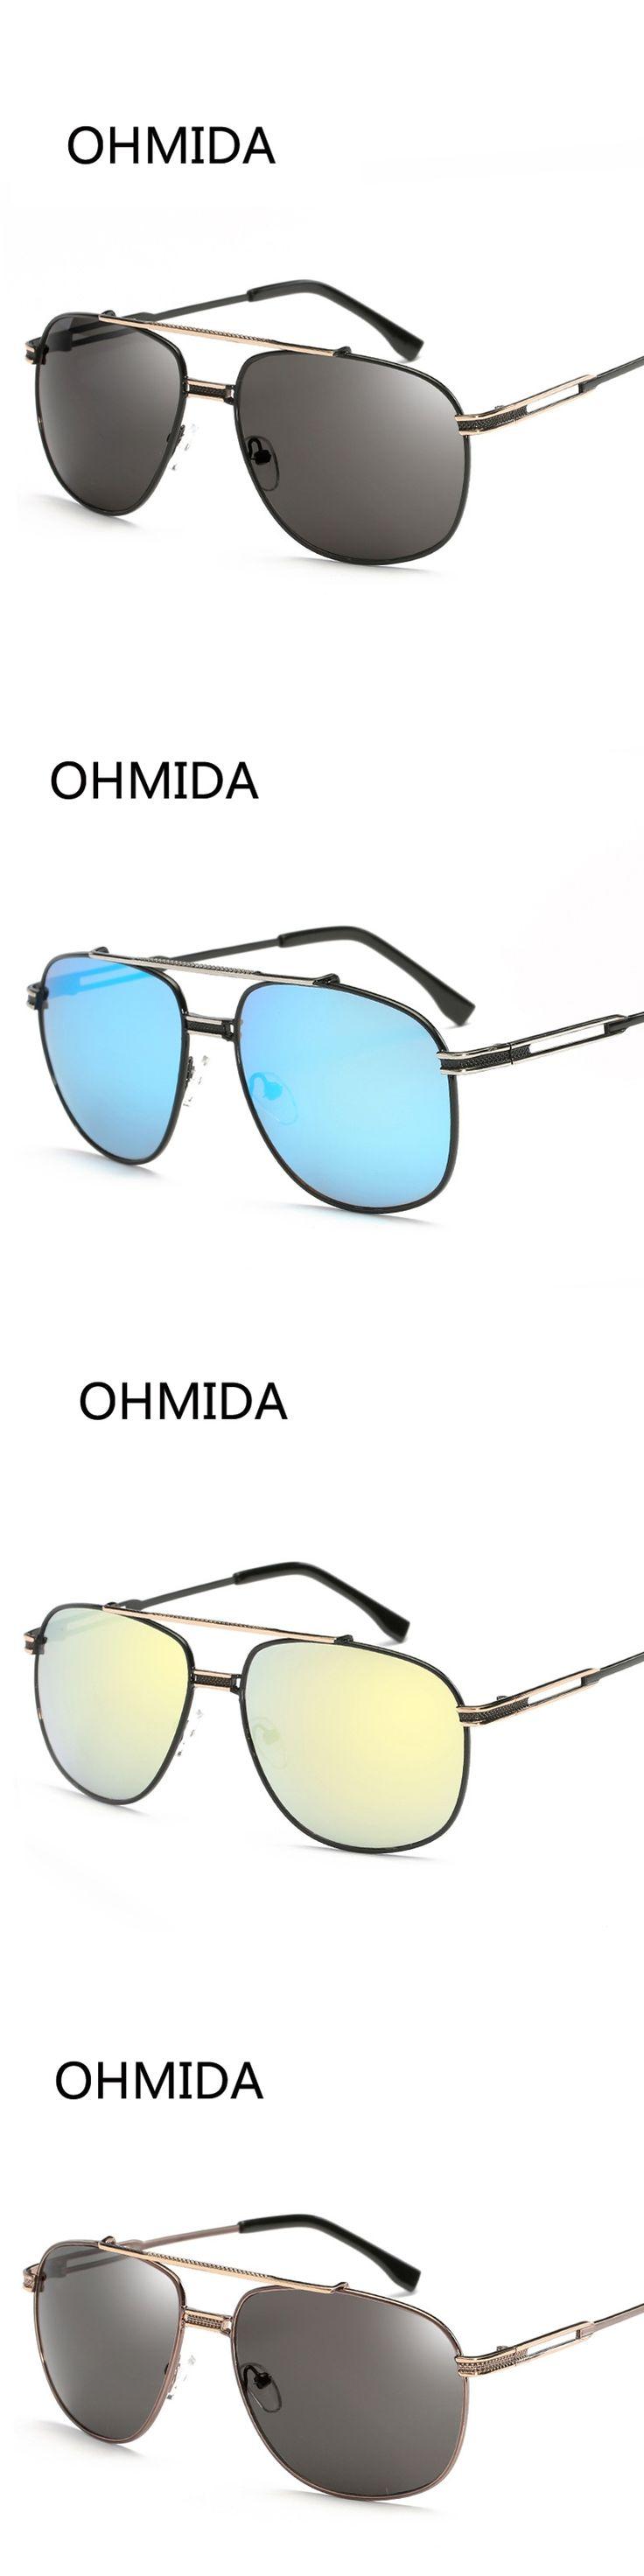 OHMIDA New Fashion Sunglasses Women Brand Designer Driver Vintage Mirror UV400 Retro Sunglasses For Men lunette de soleil femme